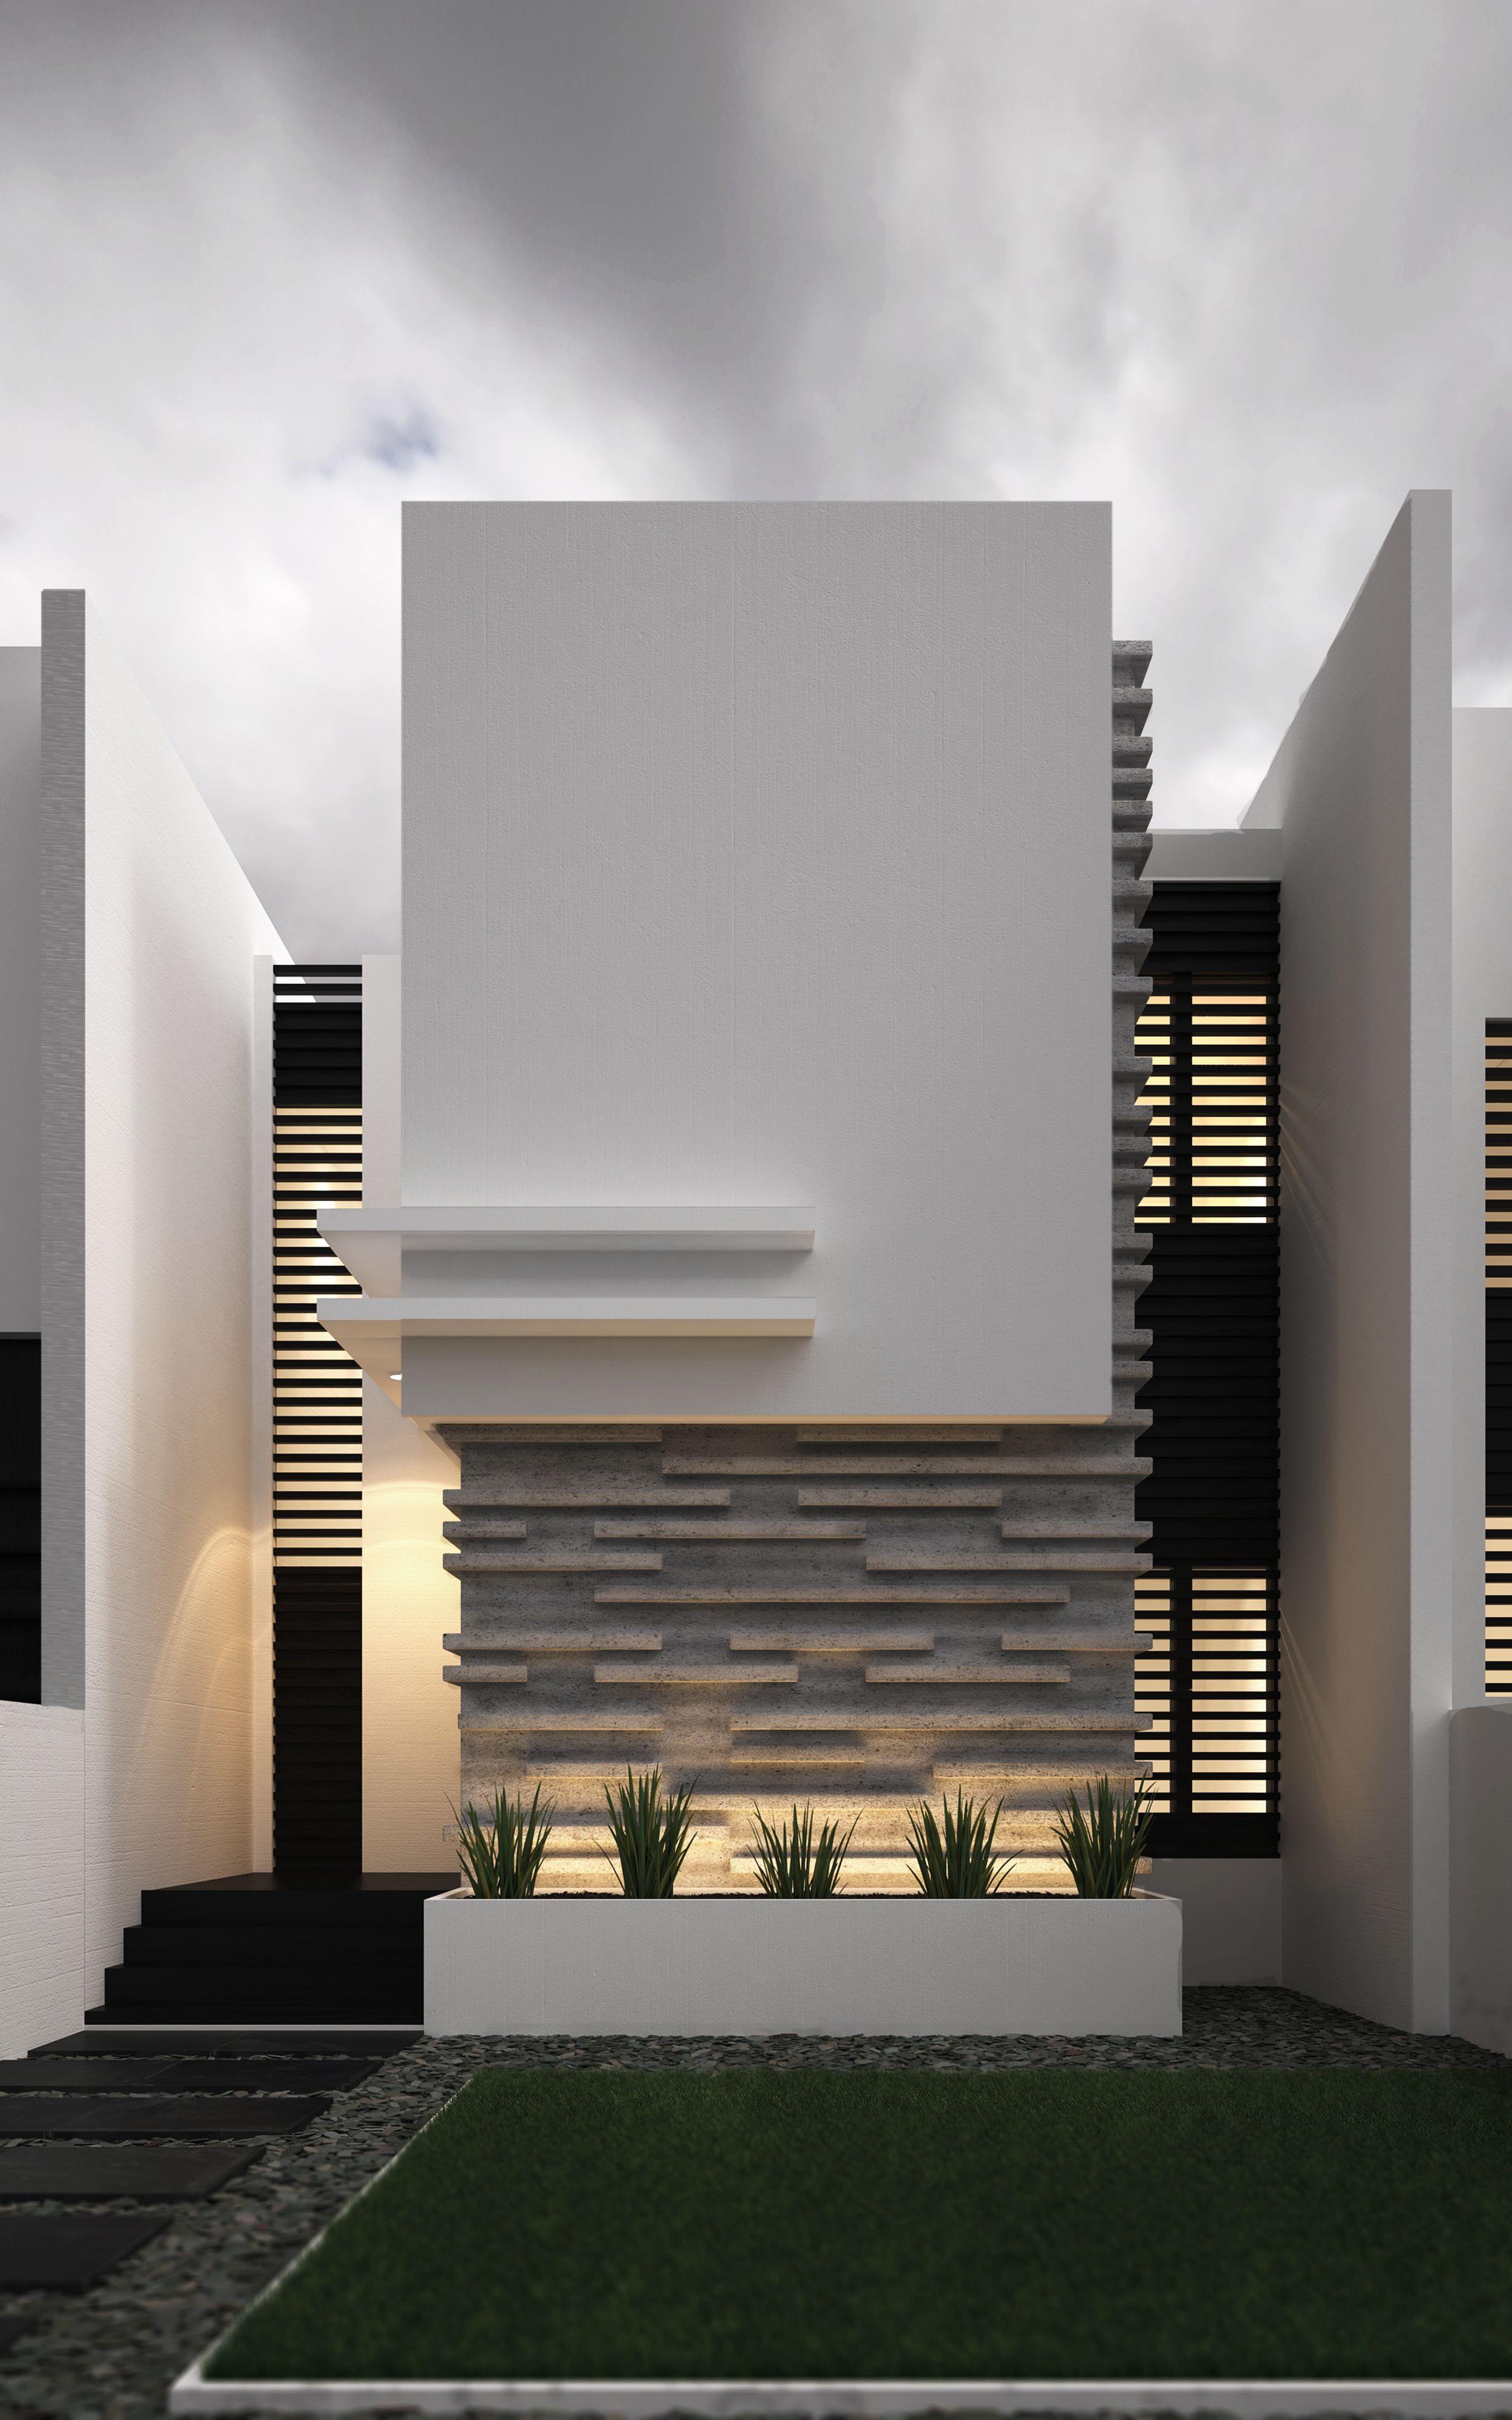 Sensacional Cuadrada Y Minimalista Pinterest Fachadas - Fachadas-minimalistas